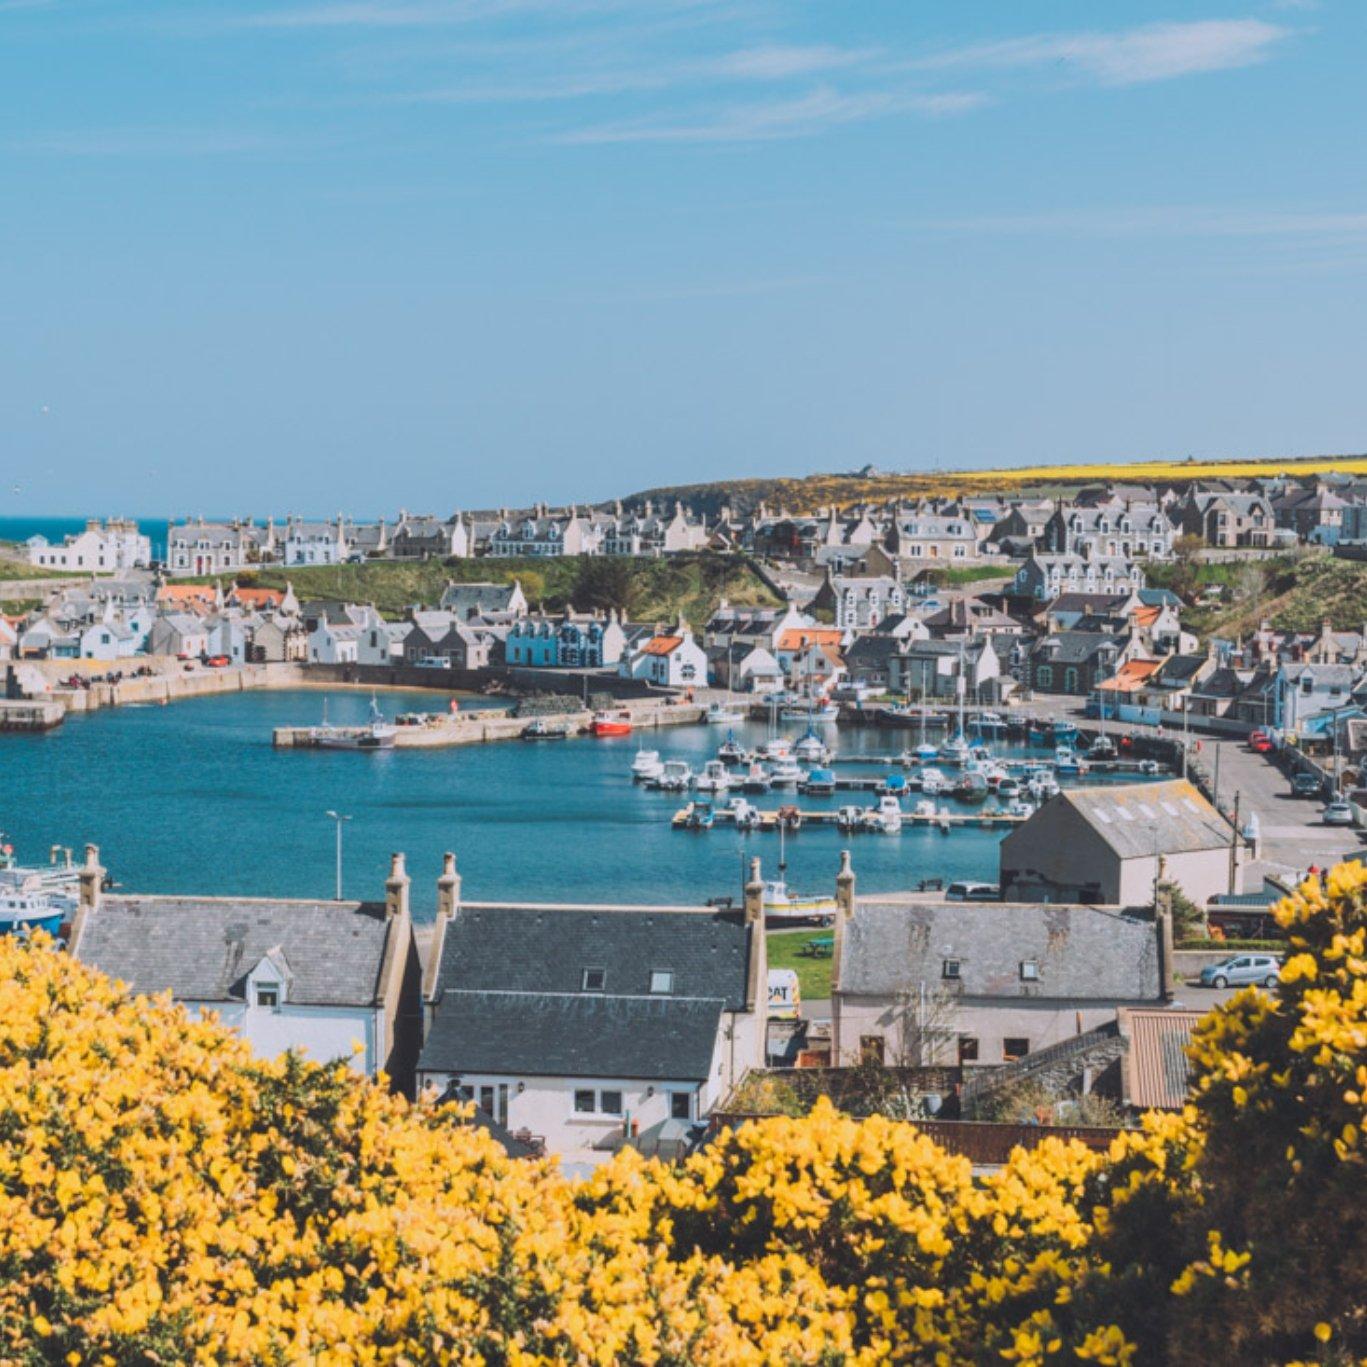 Picture of scotland coastal area